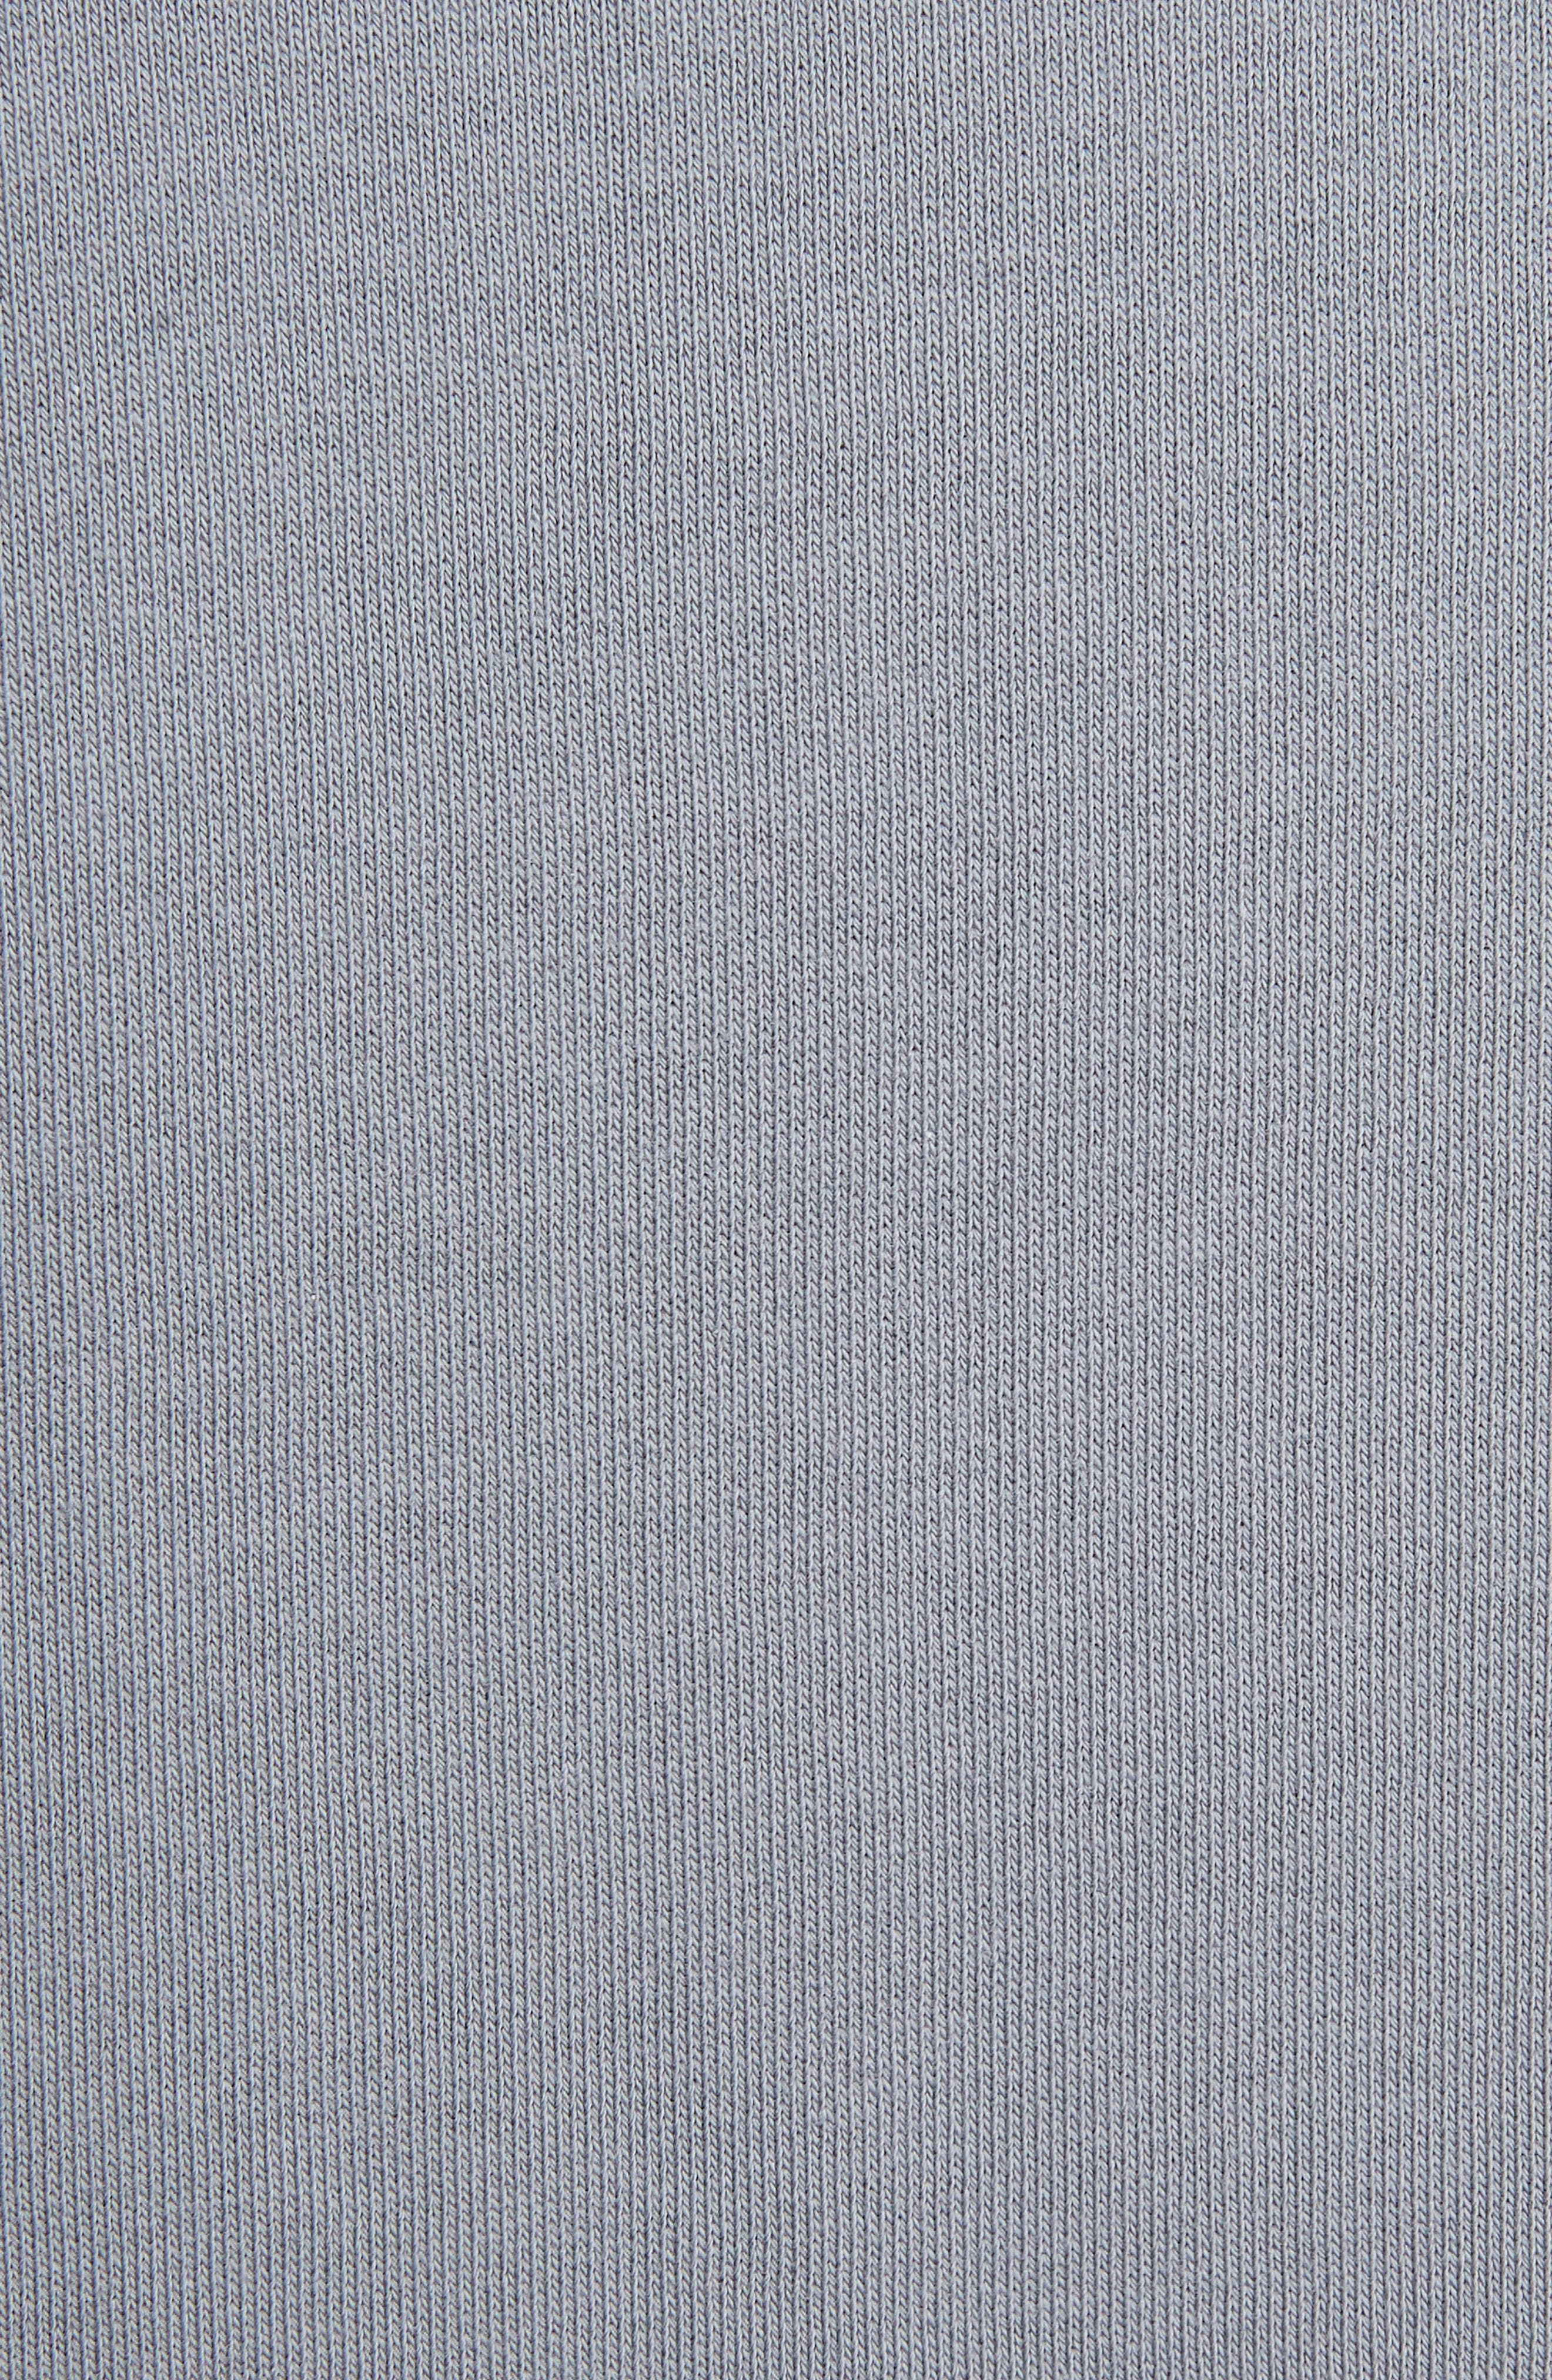 Sequin Embellished Sweatshirt,                             Alternate thumbnail 5, color,                             Grey